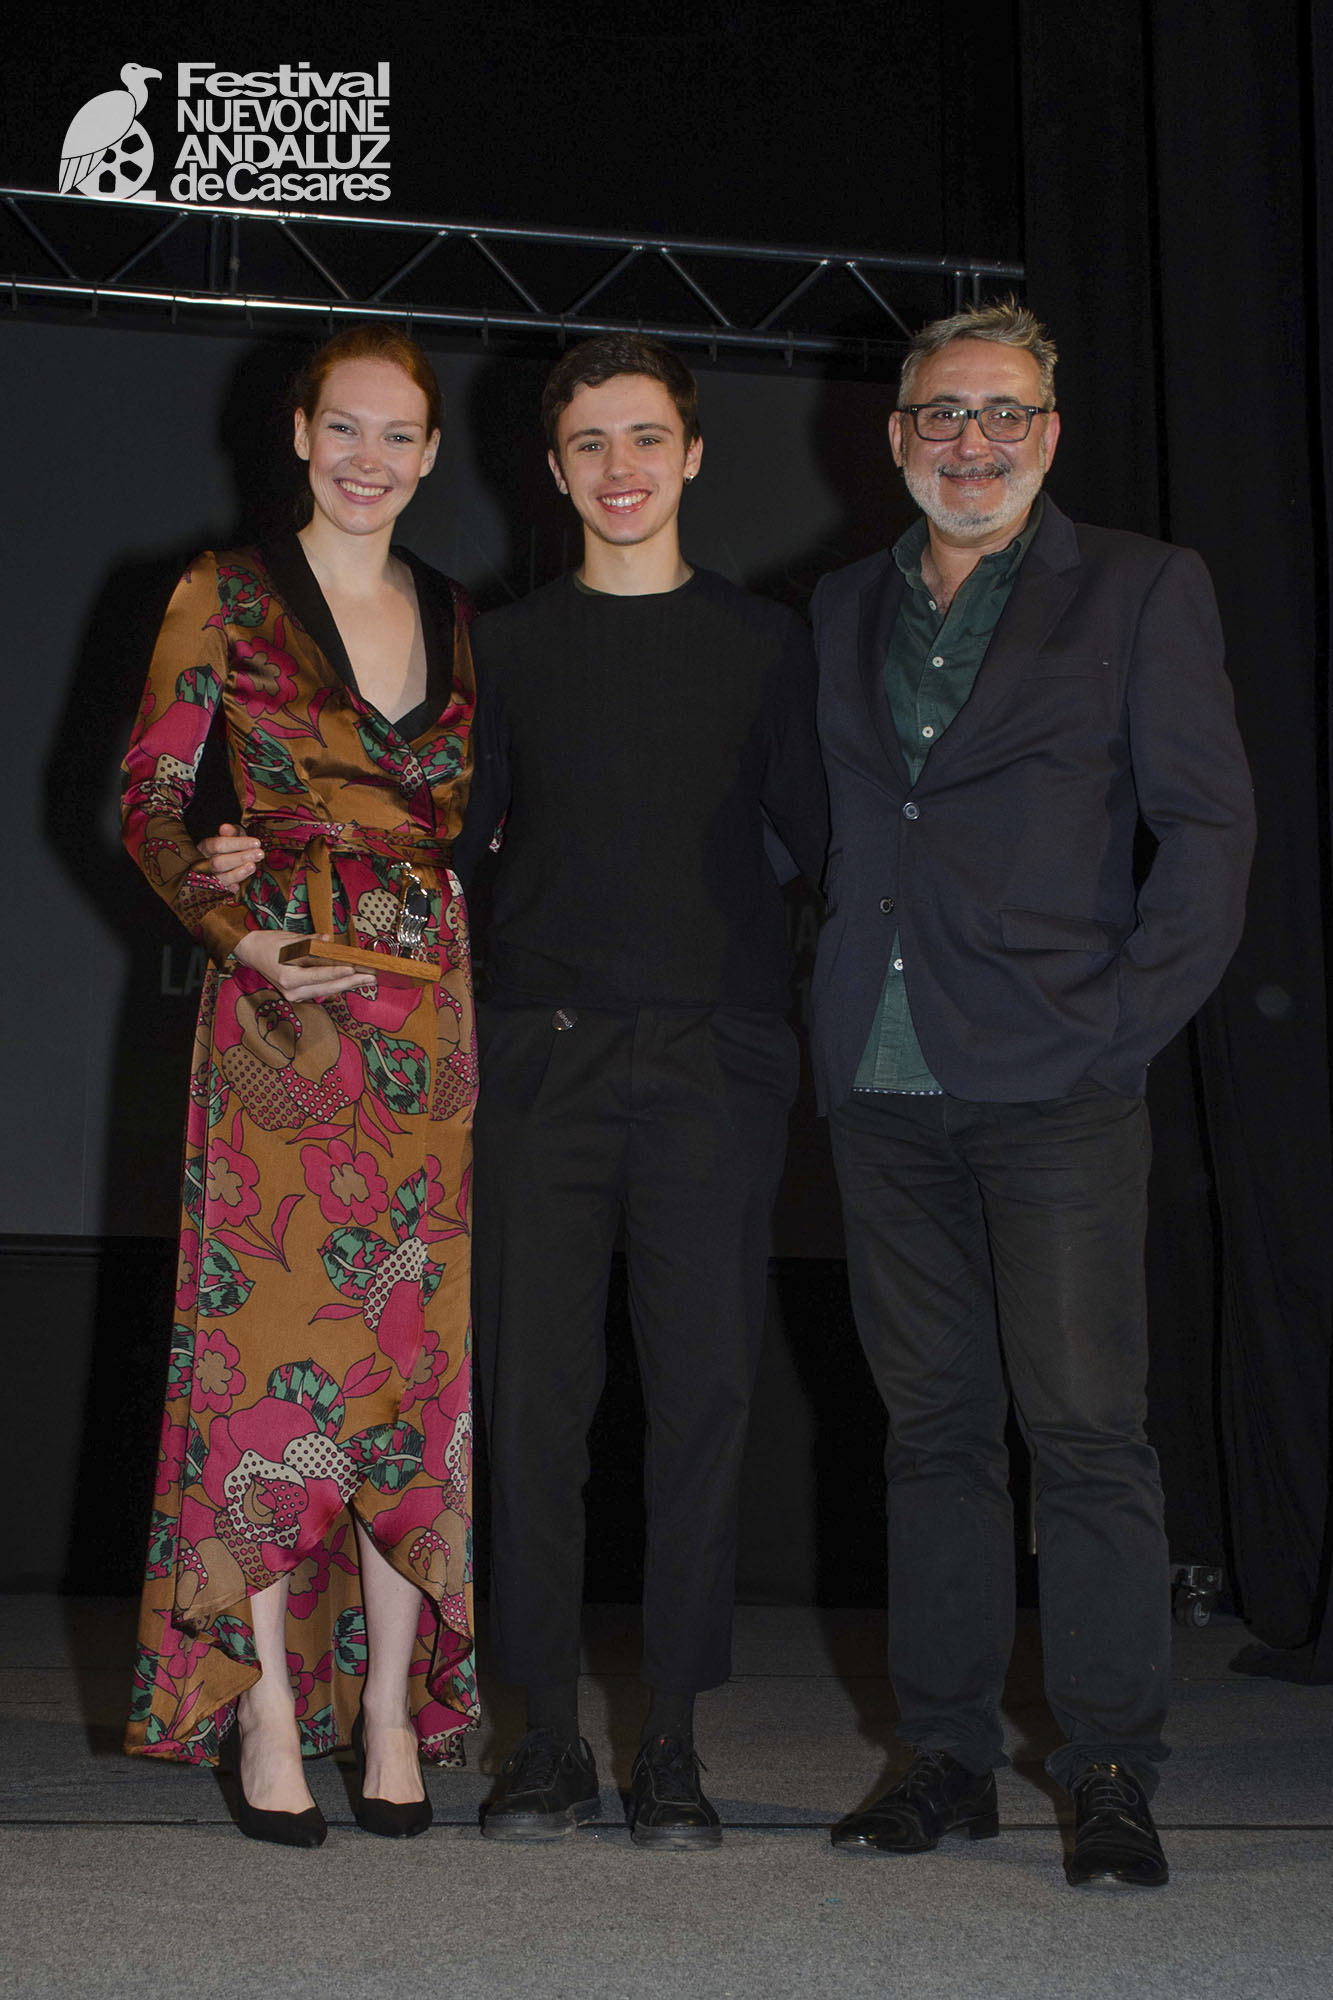 Clare Durant, Iván Pellicer y Javier Paisano